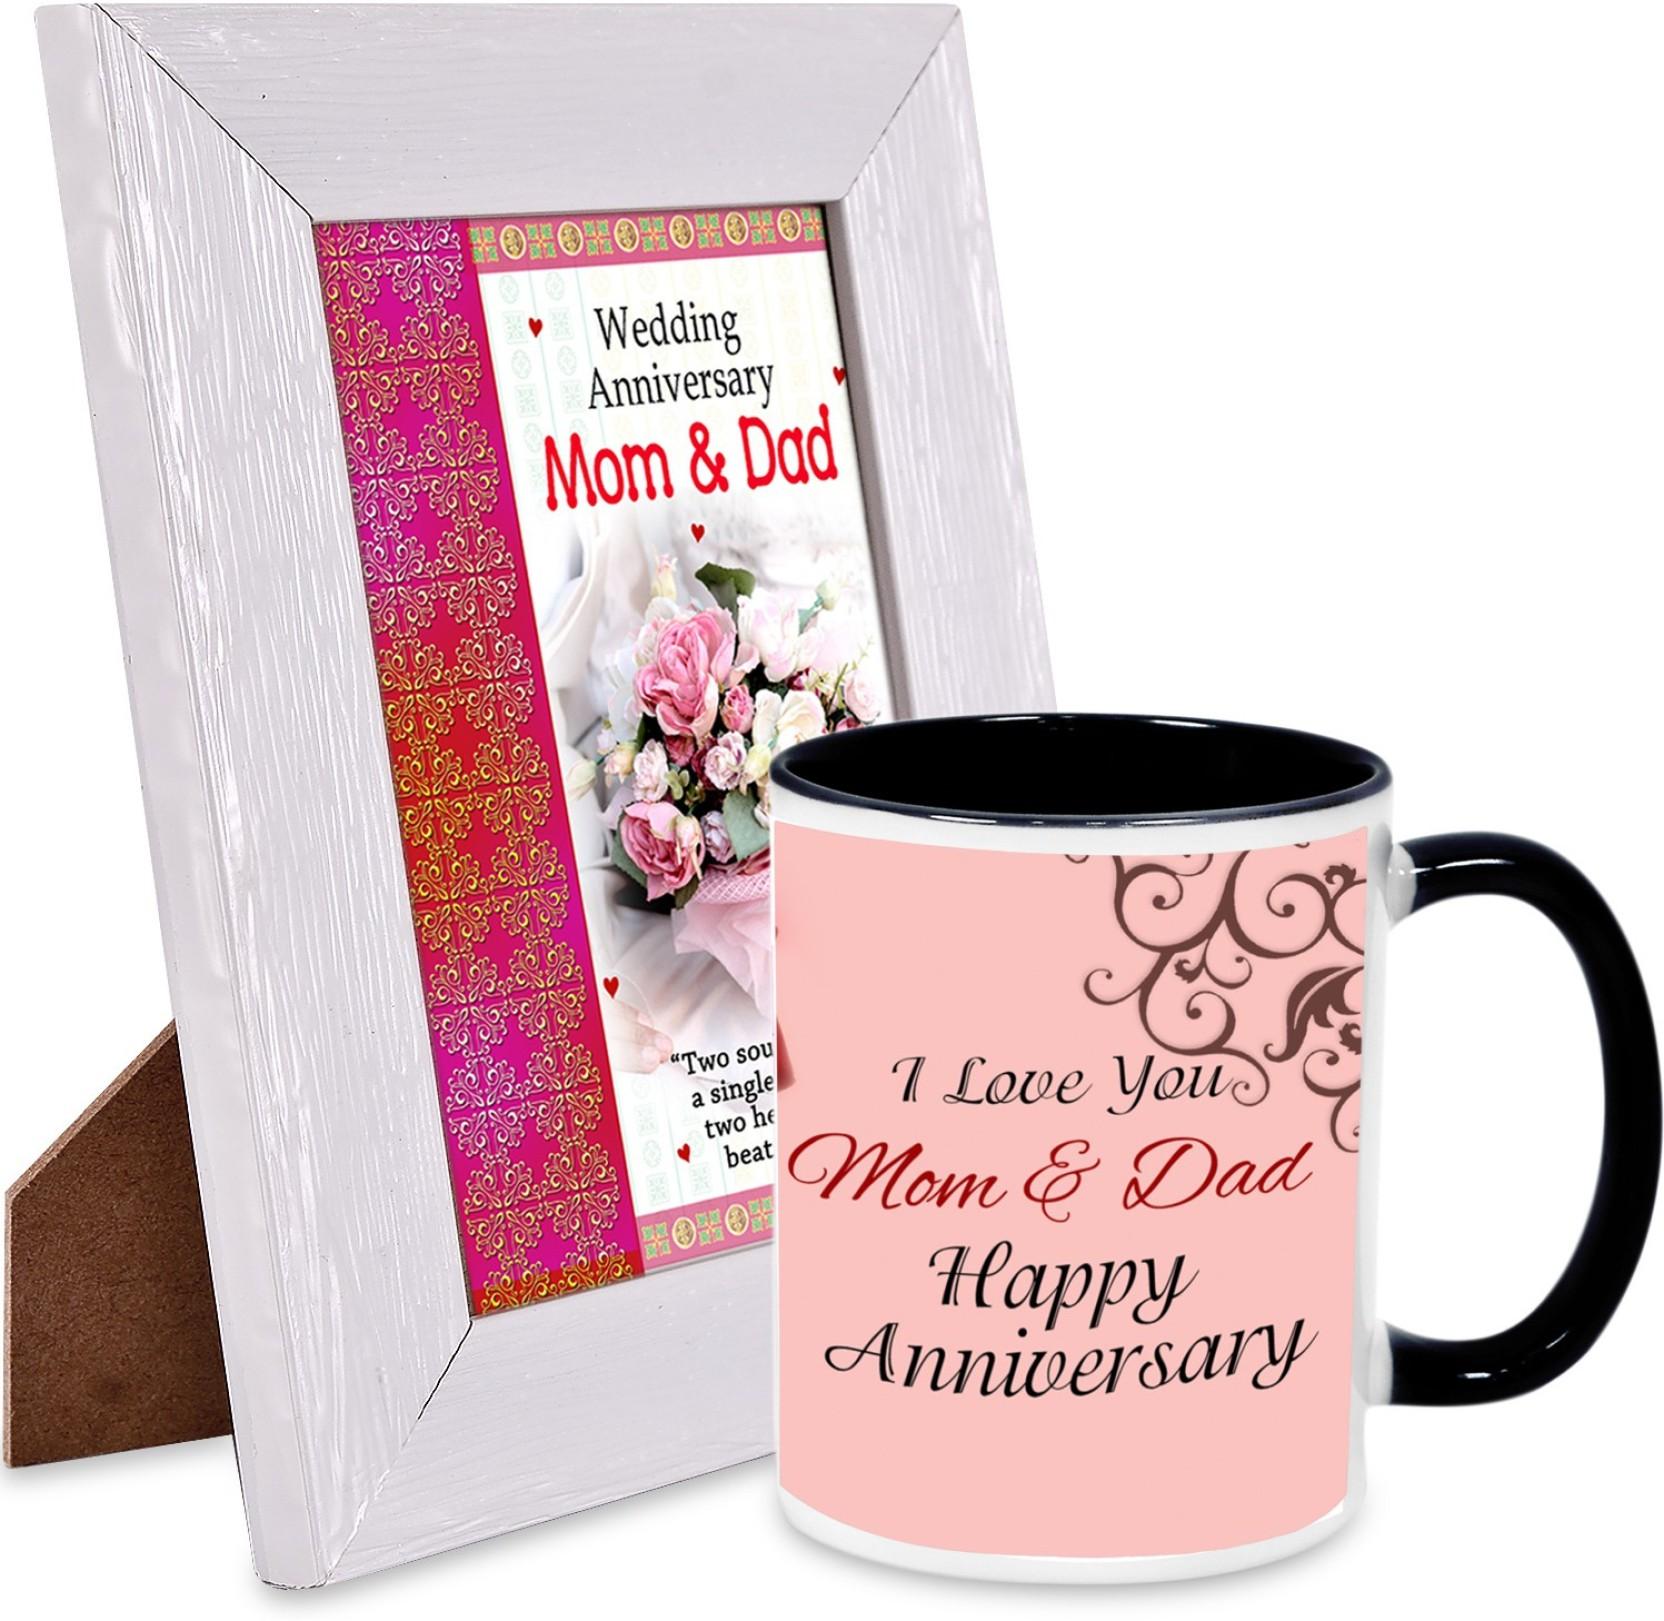 AlwaysGift Wedding Anniversary Mom & Dad Hamper Mug Gift Set Price ...